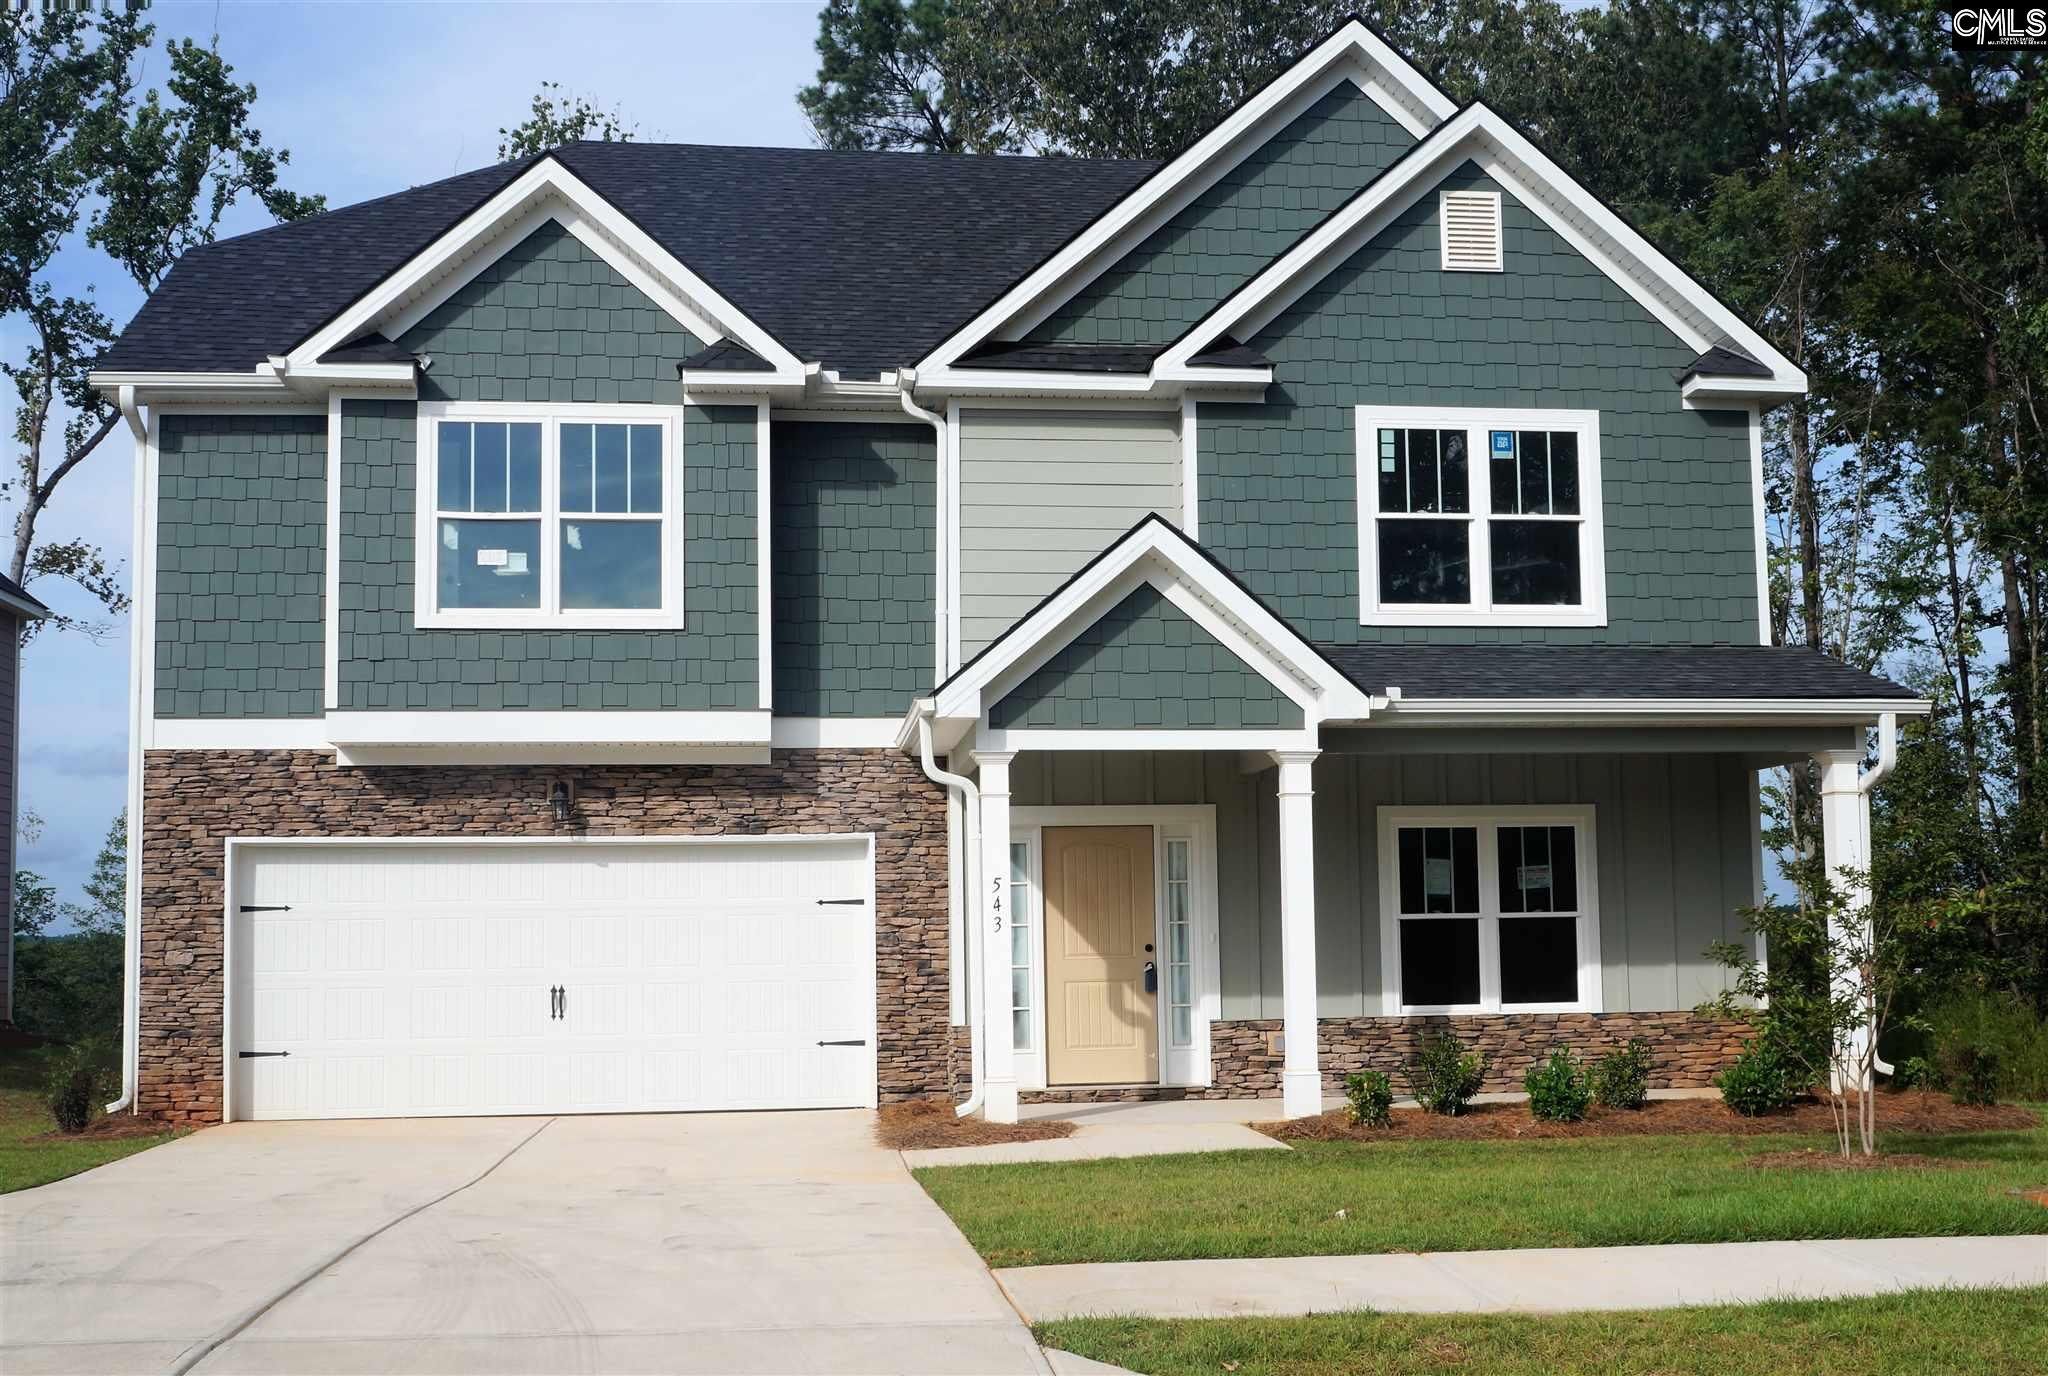 543 Treehouse #231 Lexington, SC 29072